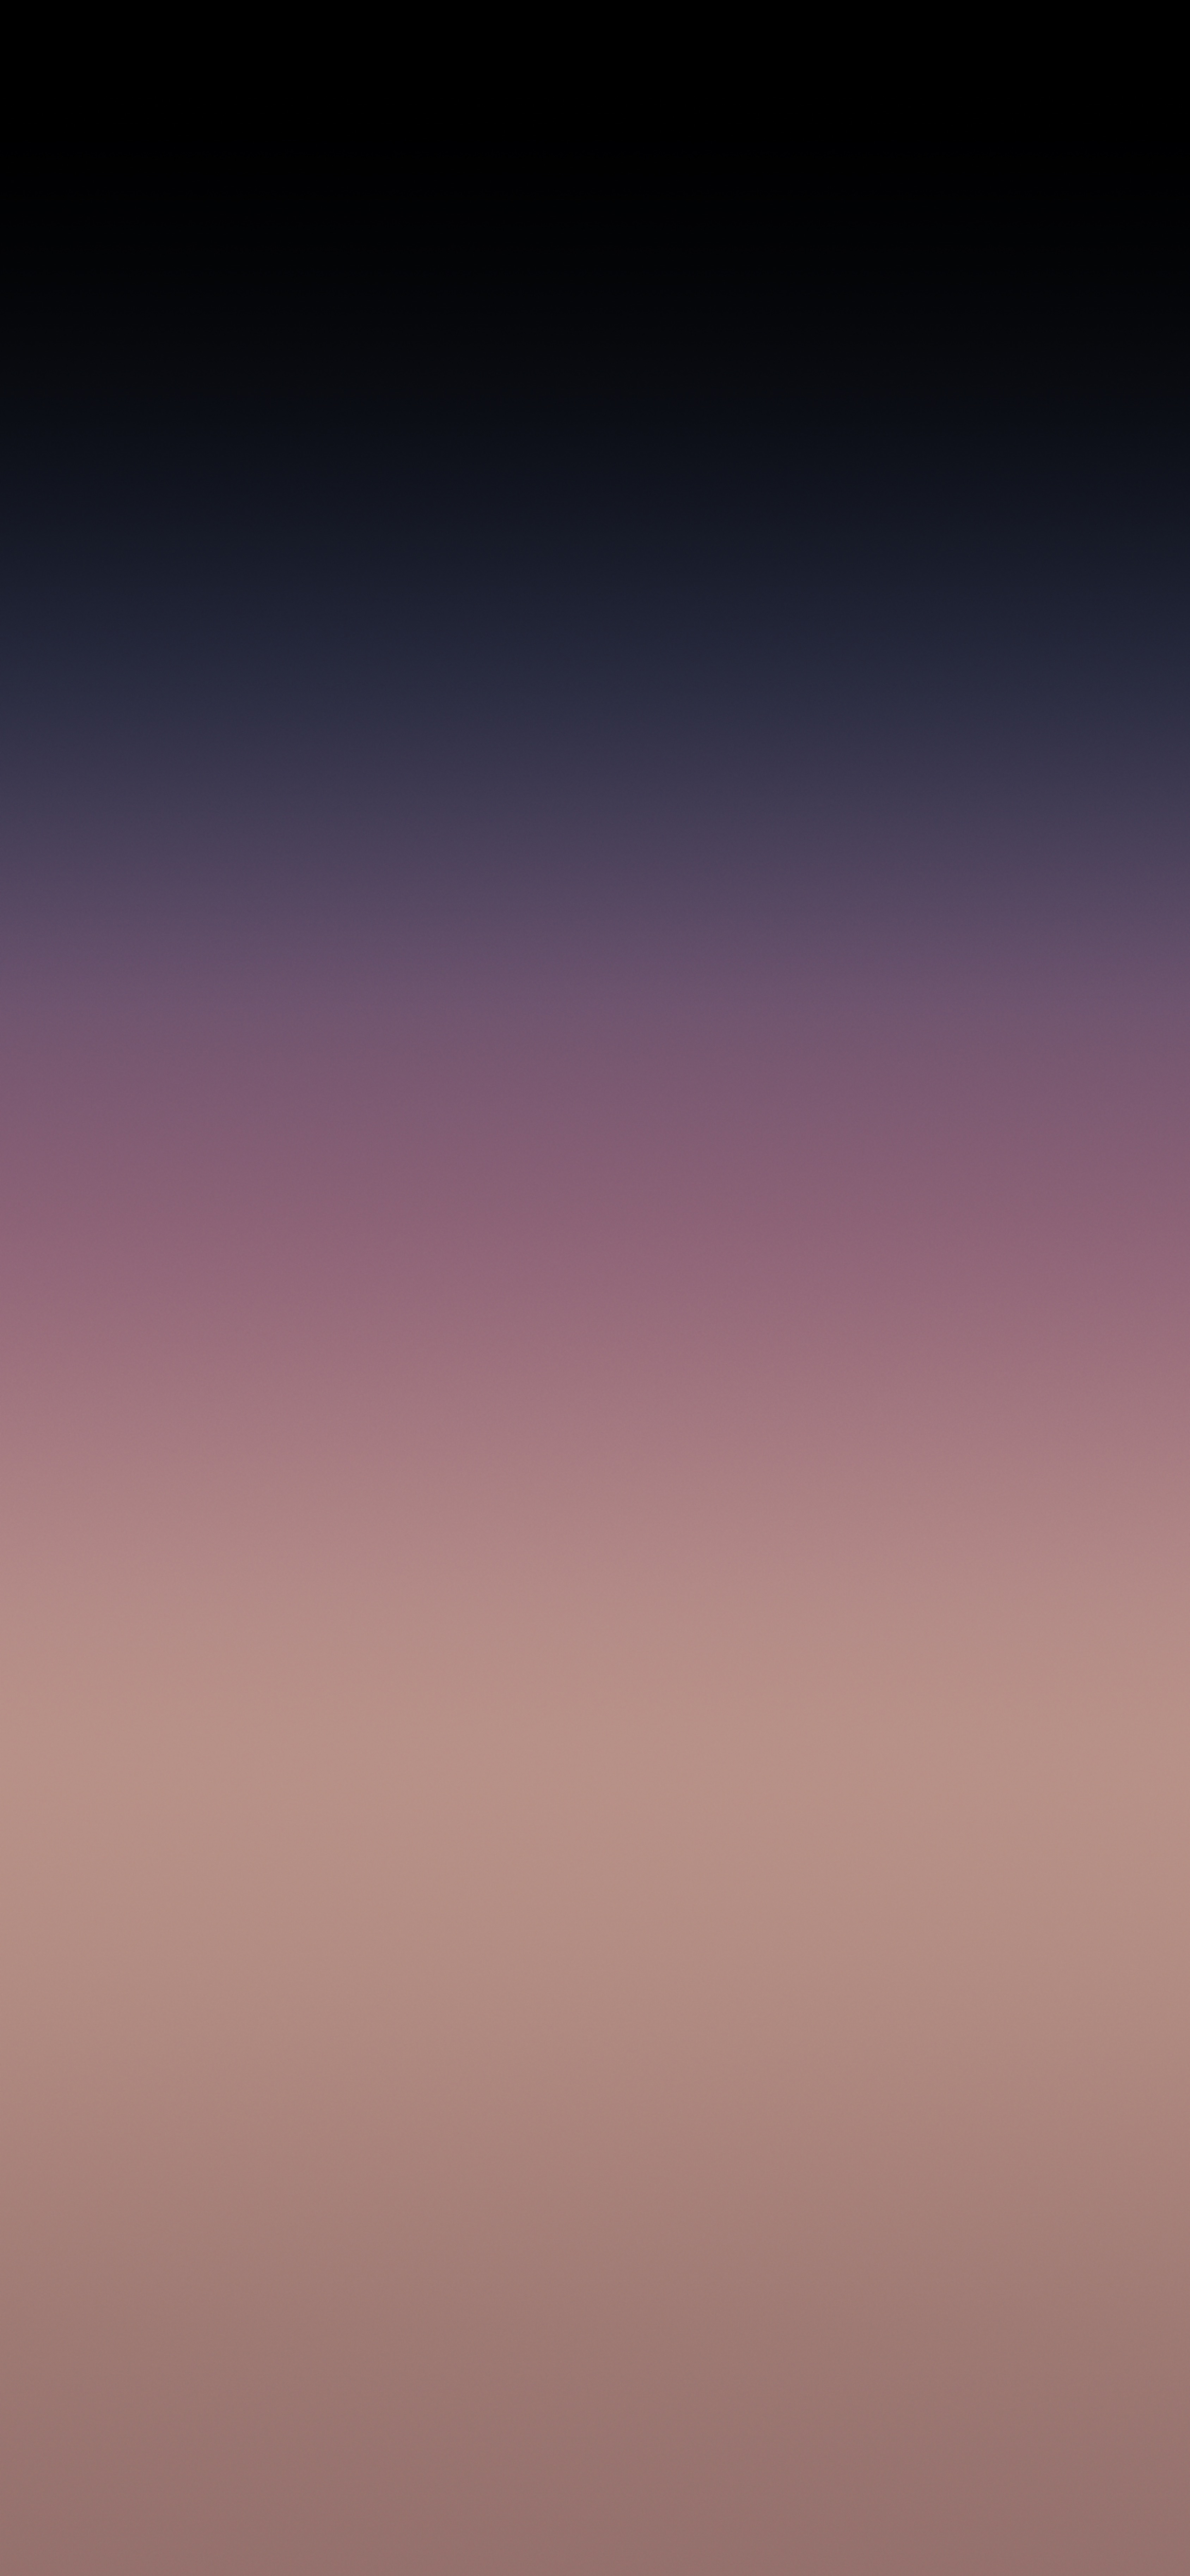 Black Gradient Wallpaper Iphone X Minimal Gradient Wallpapers To